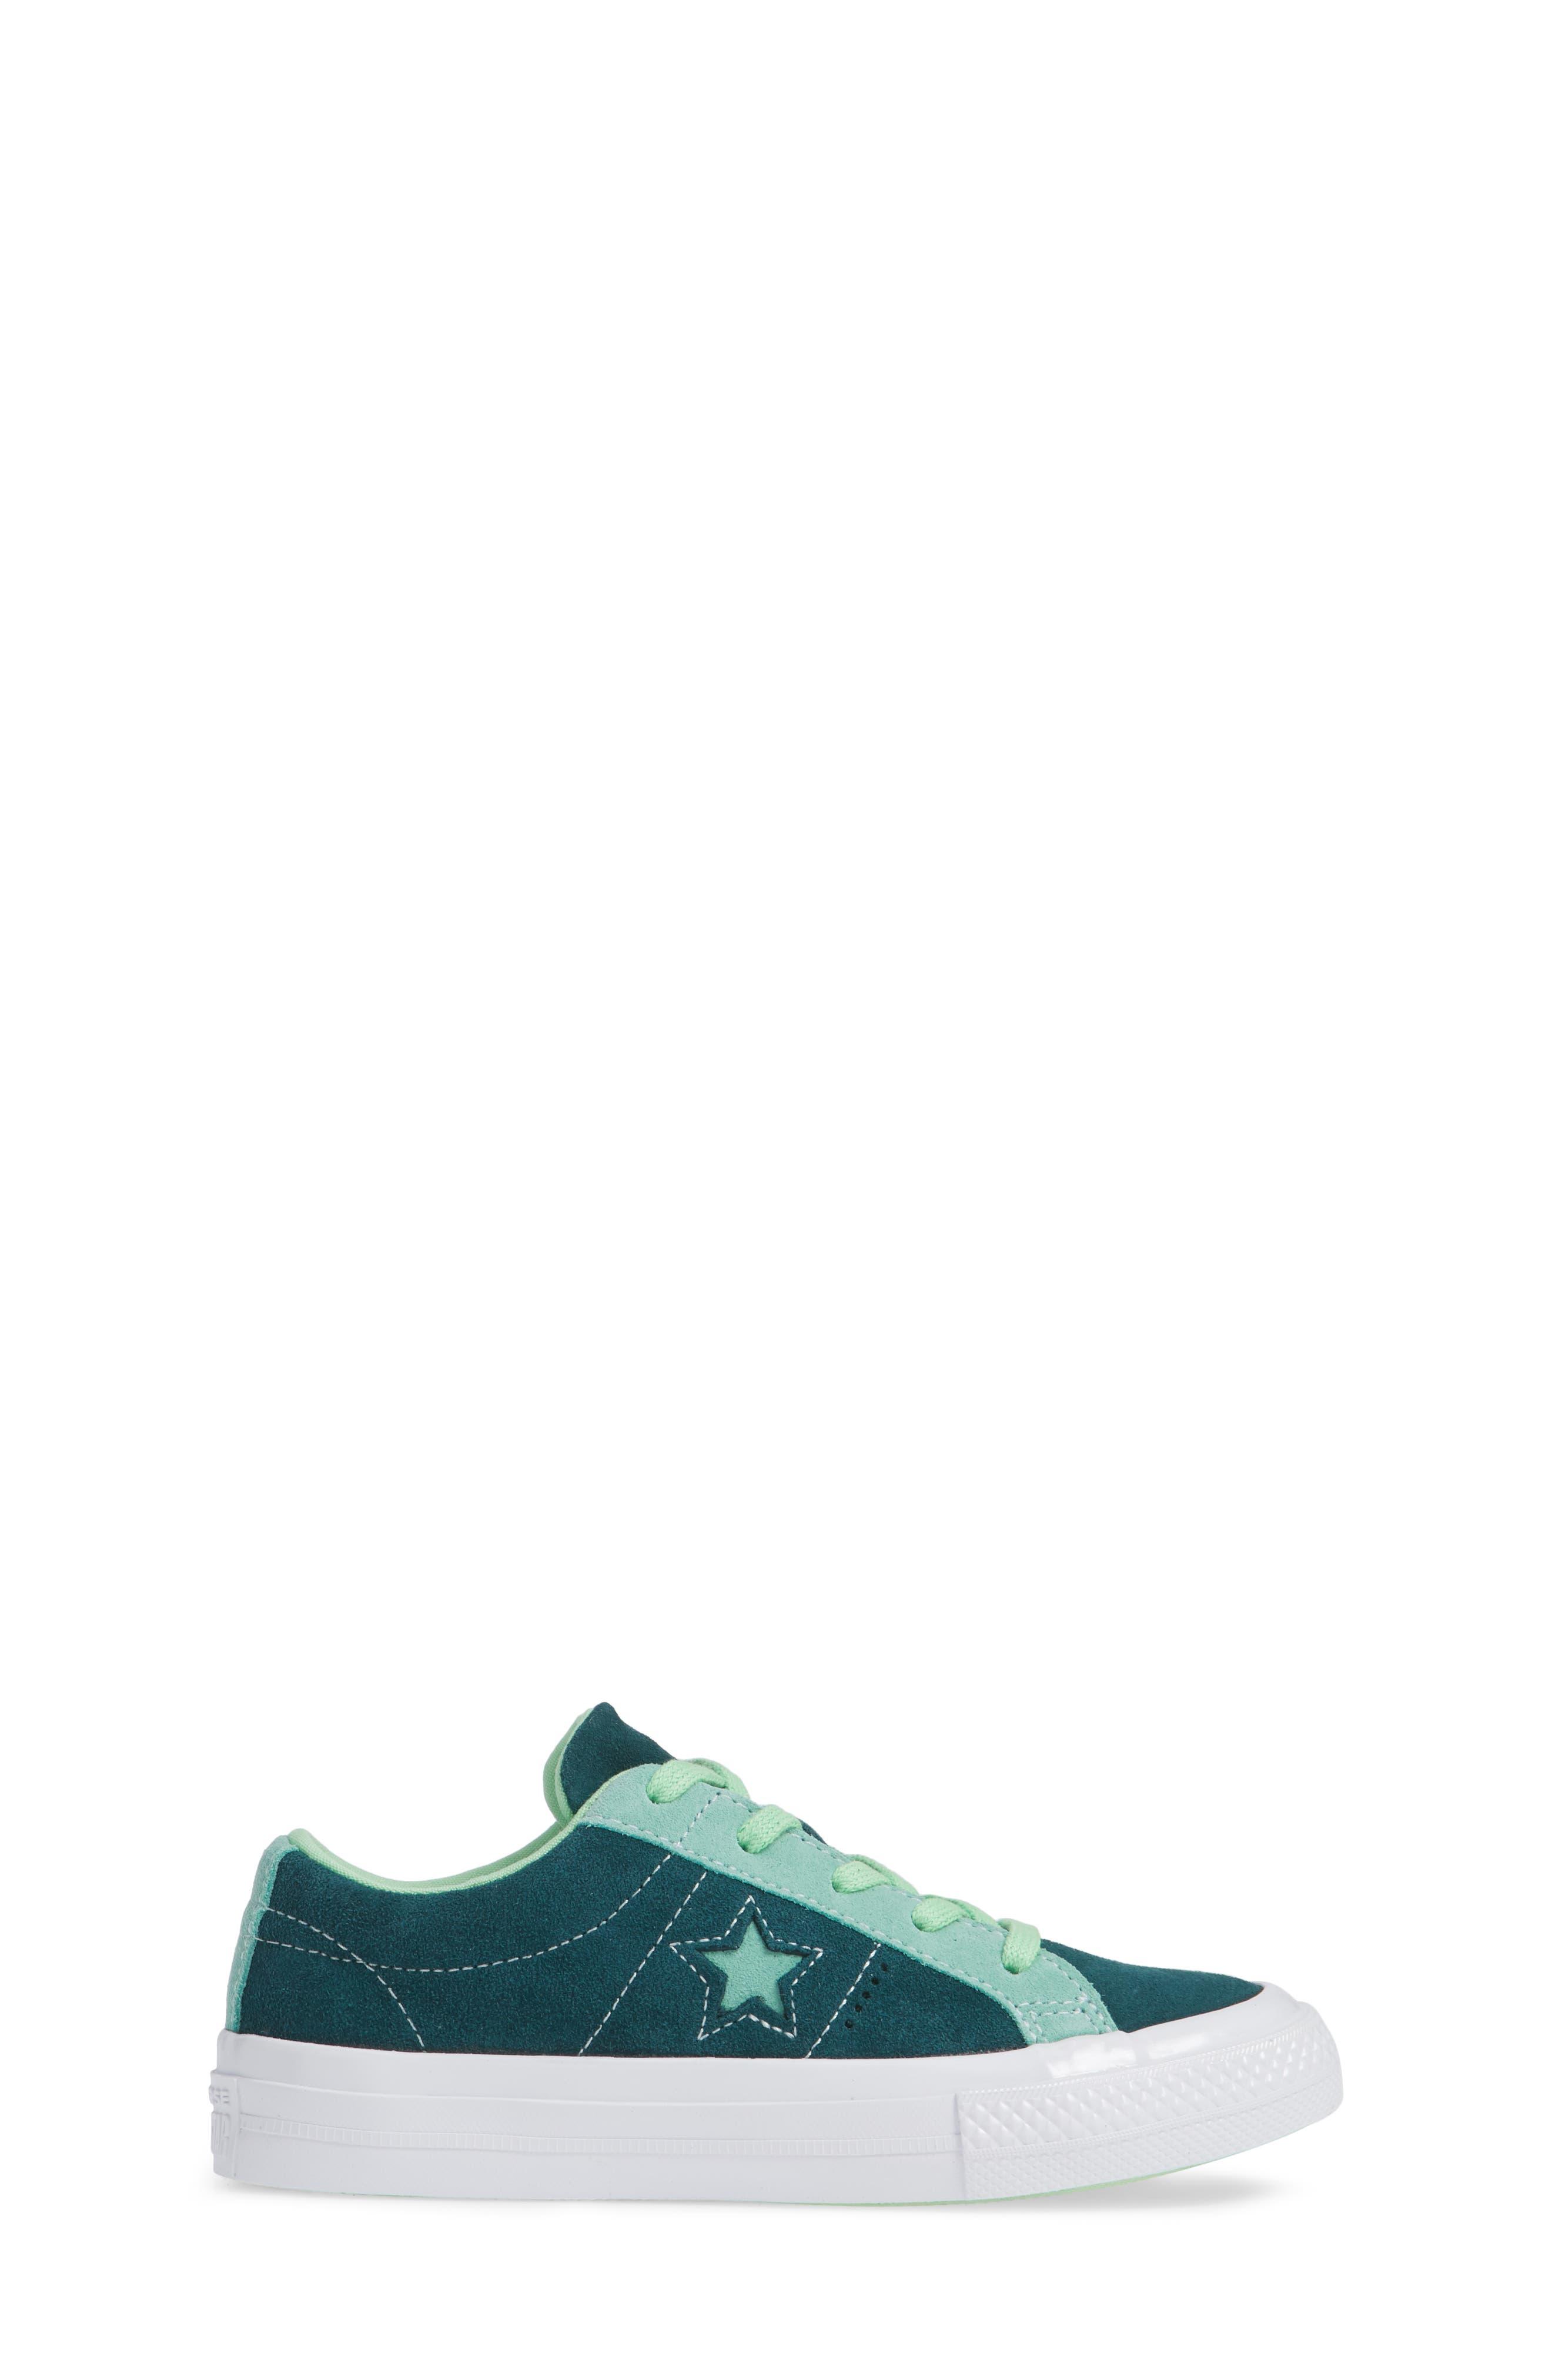 One Star Carnival Low Top Sneaker,                             Alternate thumbnail 3, color,                             345